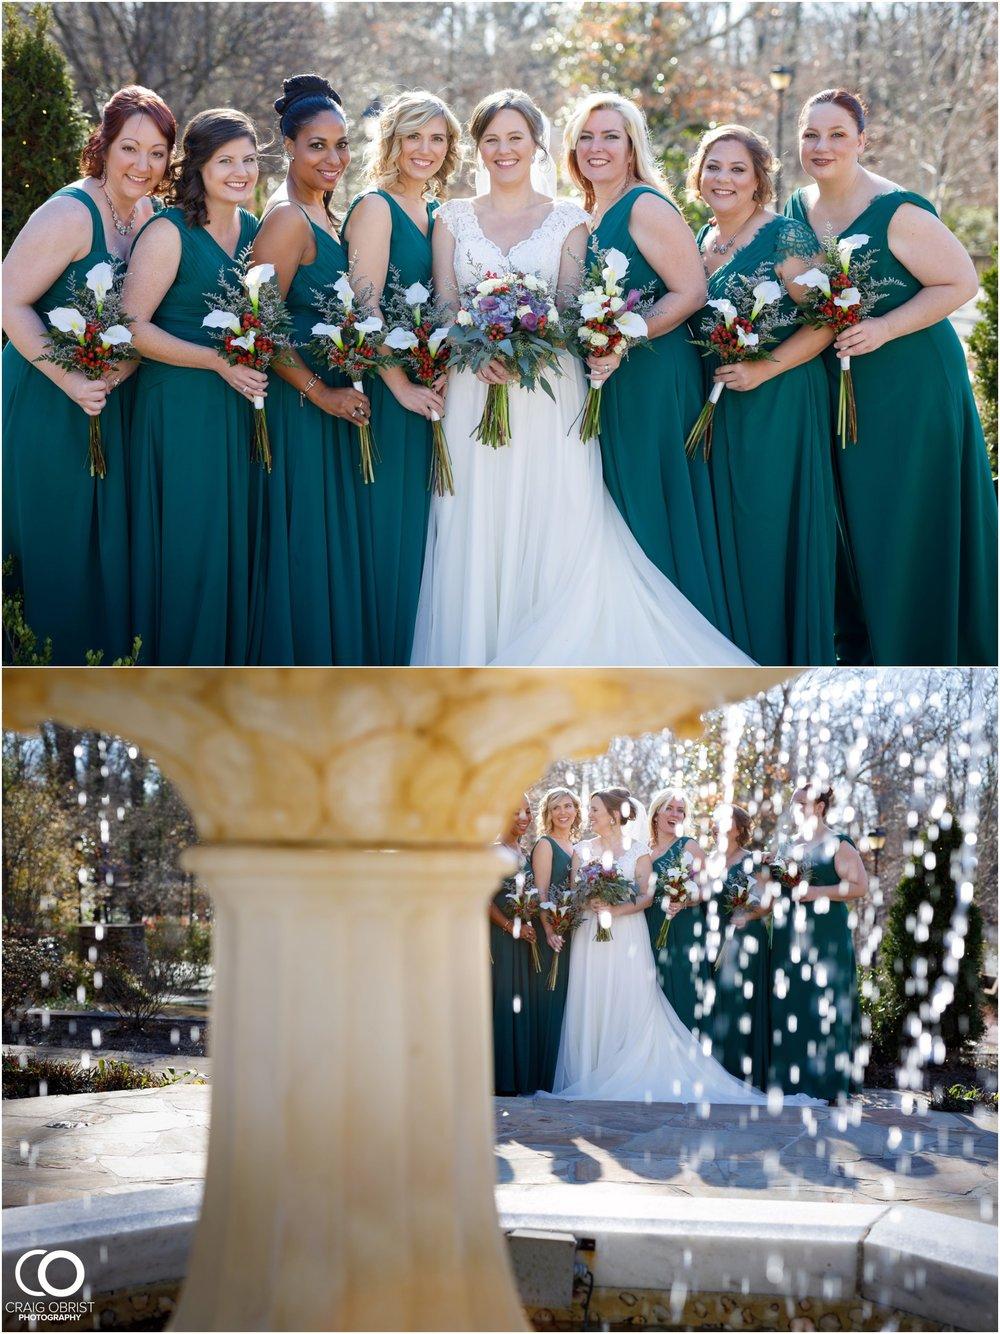 Callanwolde-Fine-Arts-Center Wedding Atlanta Georgia Dec 2017_0038.jpg